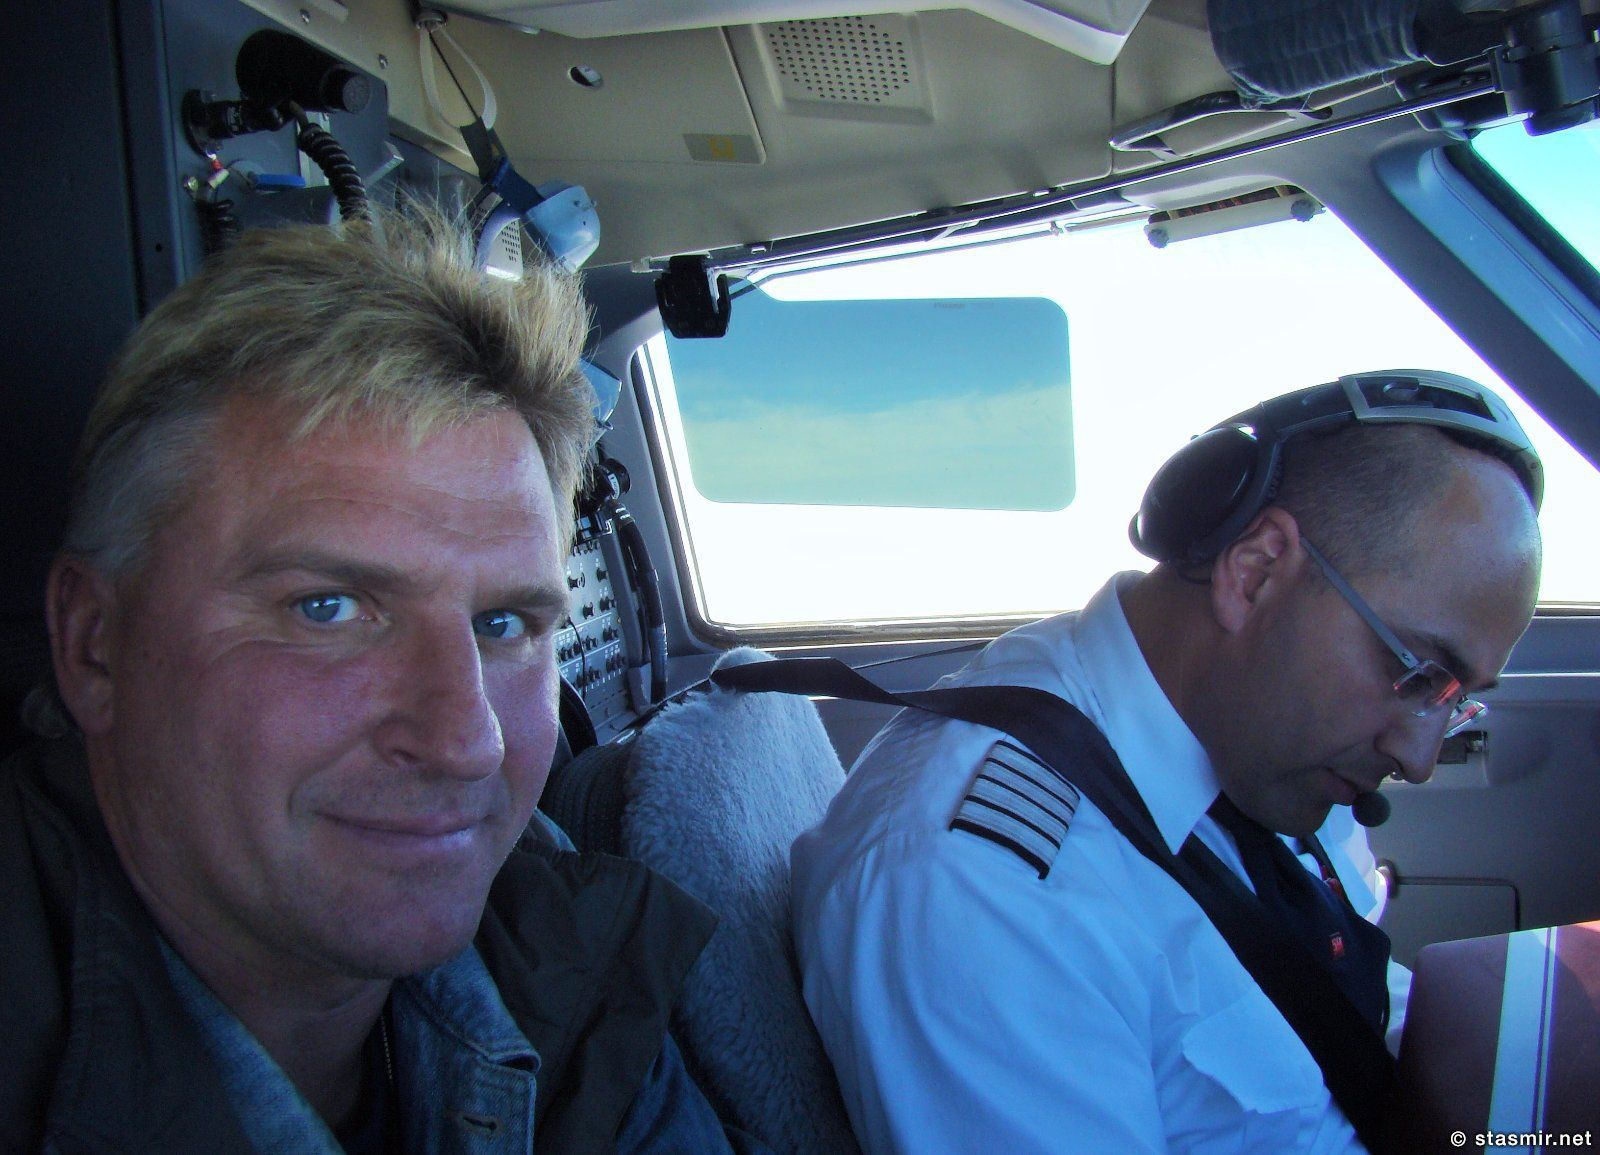 внутри самолета greenland air, photo Stasmir, фото Стасмир